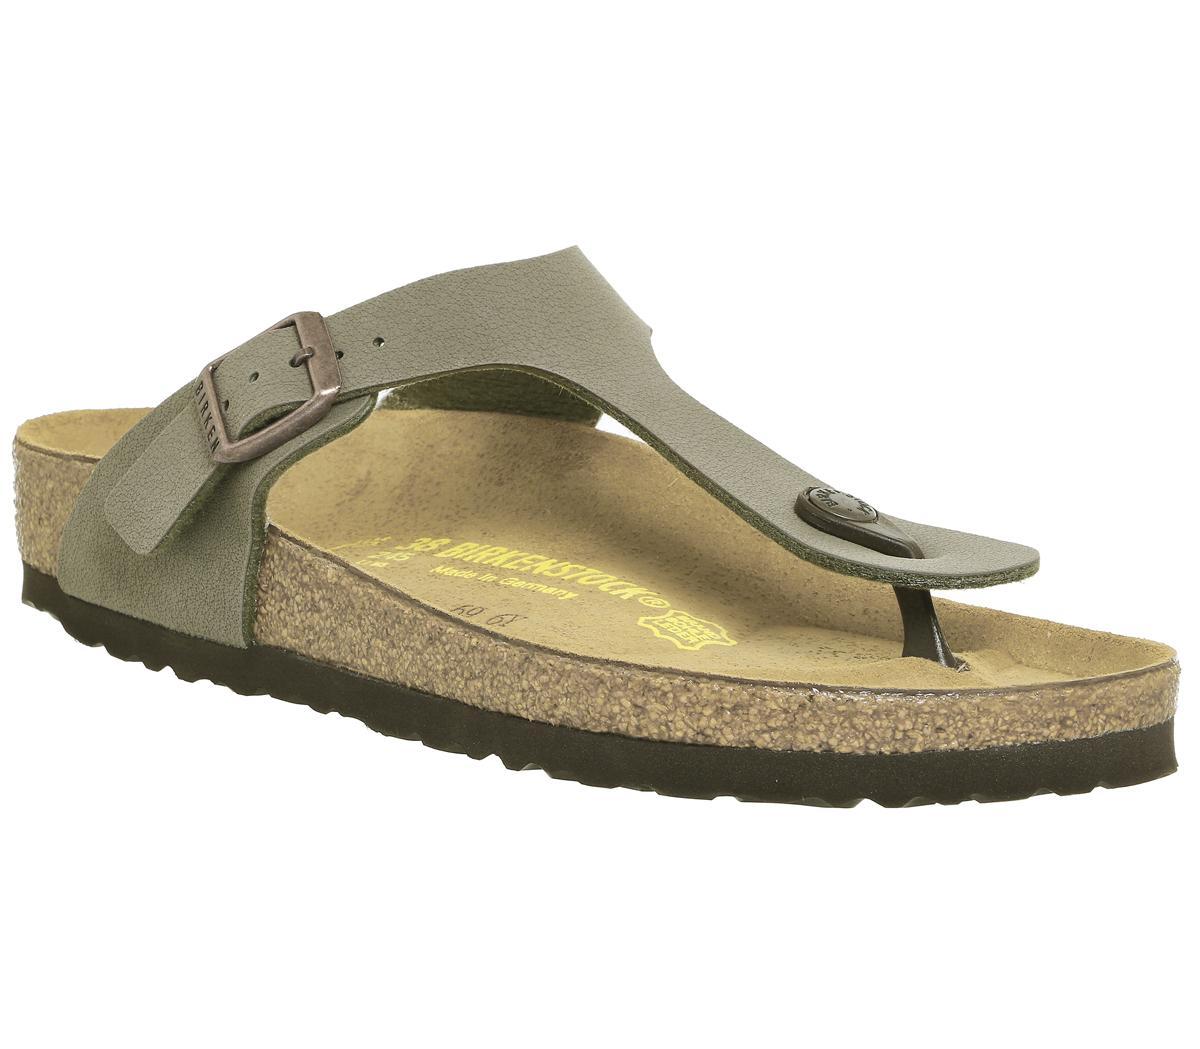 21ef07e58a6eb Birkenstock Toe Thong Footbed Sandals Stone - Sandals